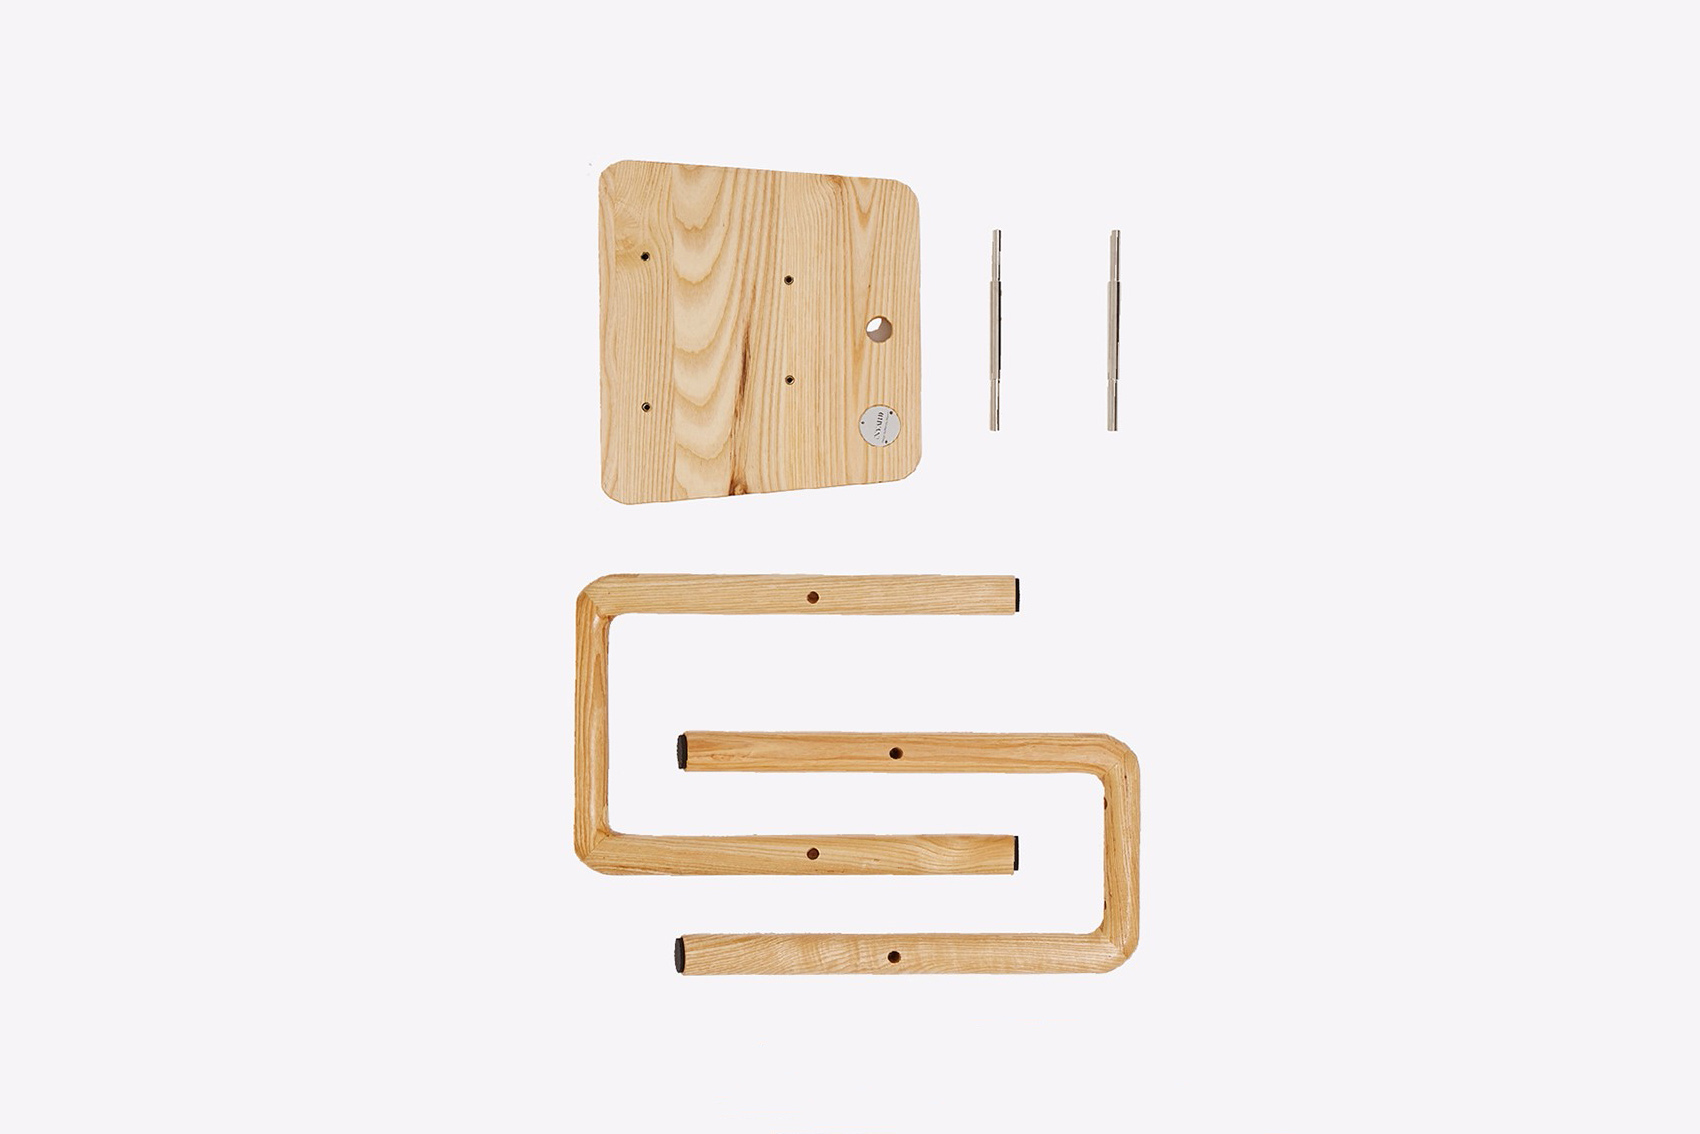 inyard-mendesmacedo-arco-stool-5.jpg